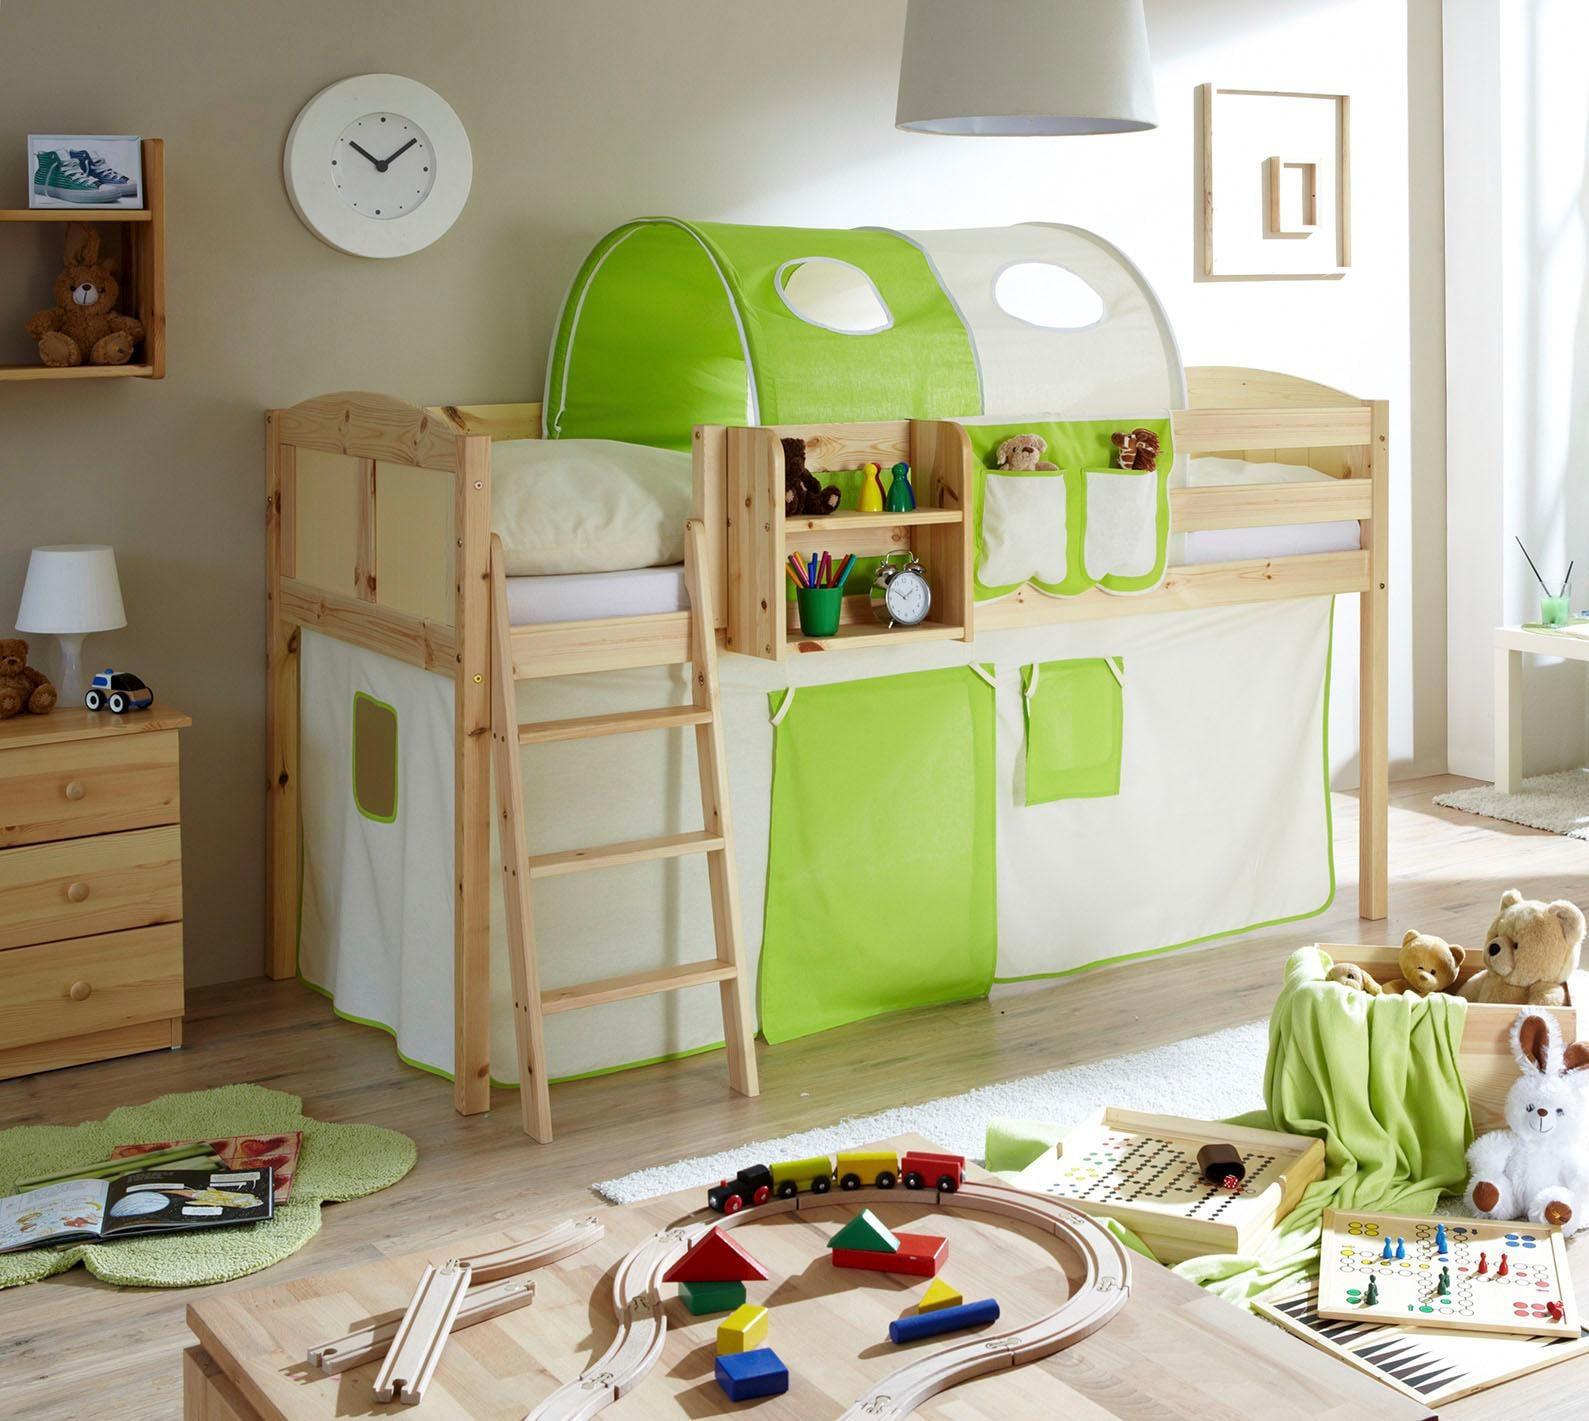 Ticaa Hochbett Eric grün Kinder Kinderbetten Kindermöbel